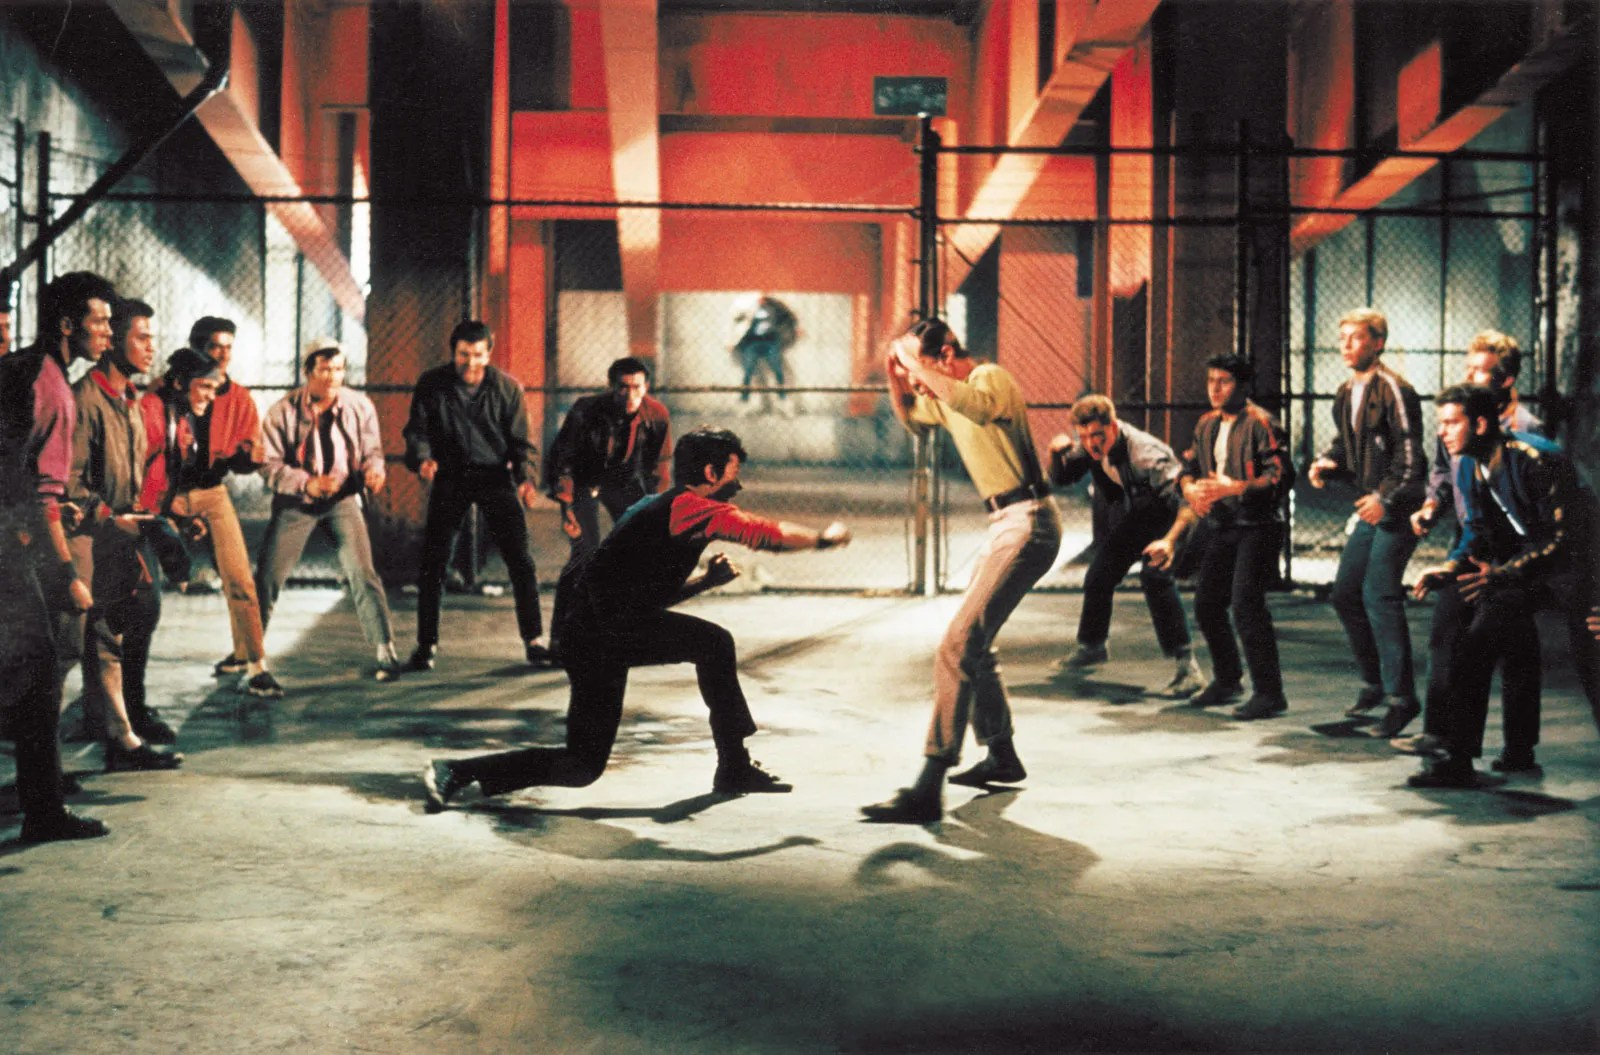 West Side Story   Plot,但為了適應音樂劇與電影之間的差異,莎士比亞的「羅密歐與茱麗葉」被搬到現代的紐約街頭, & Facts   Britannica